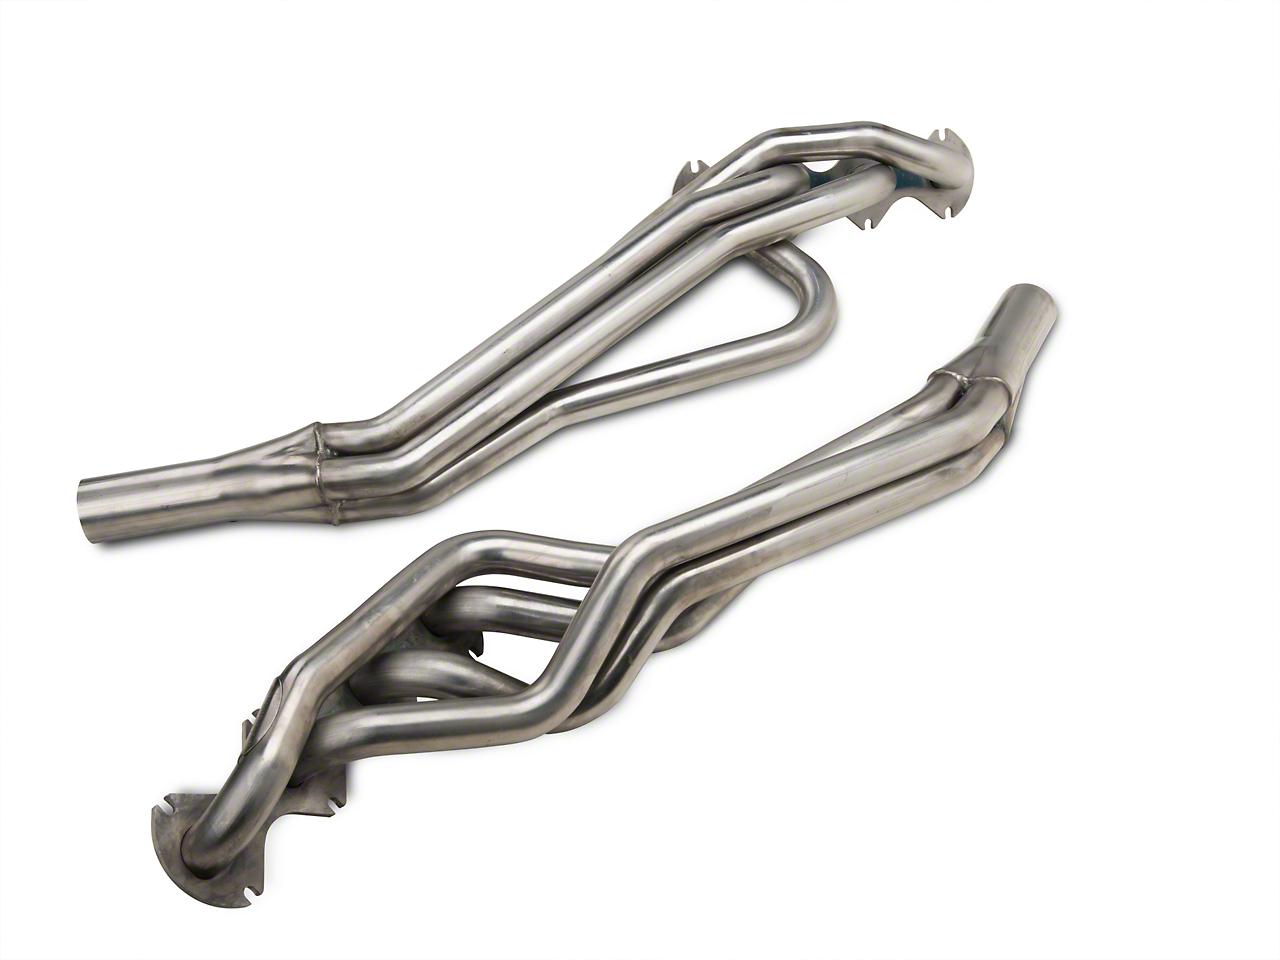 JBA 1-5/8 in. Natural Long Tube Headers (05-10 GT)